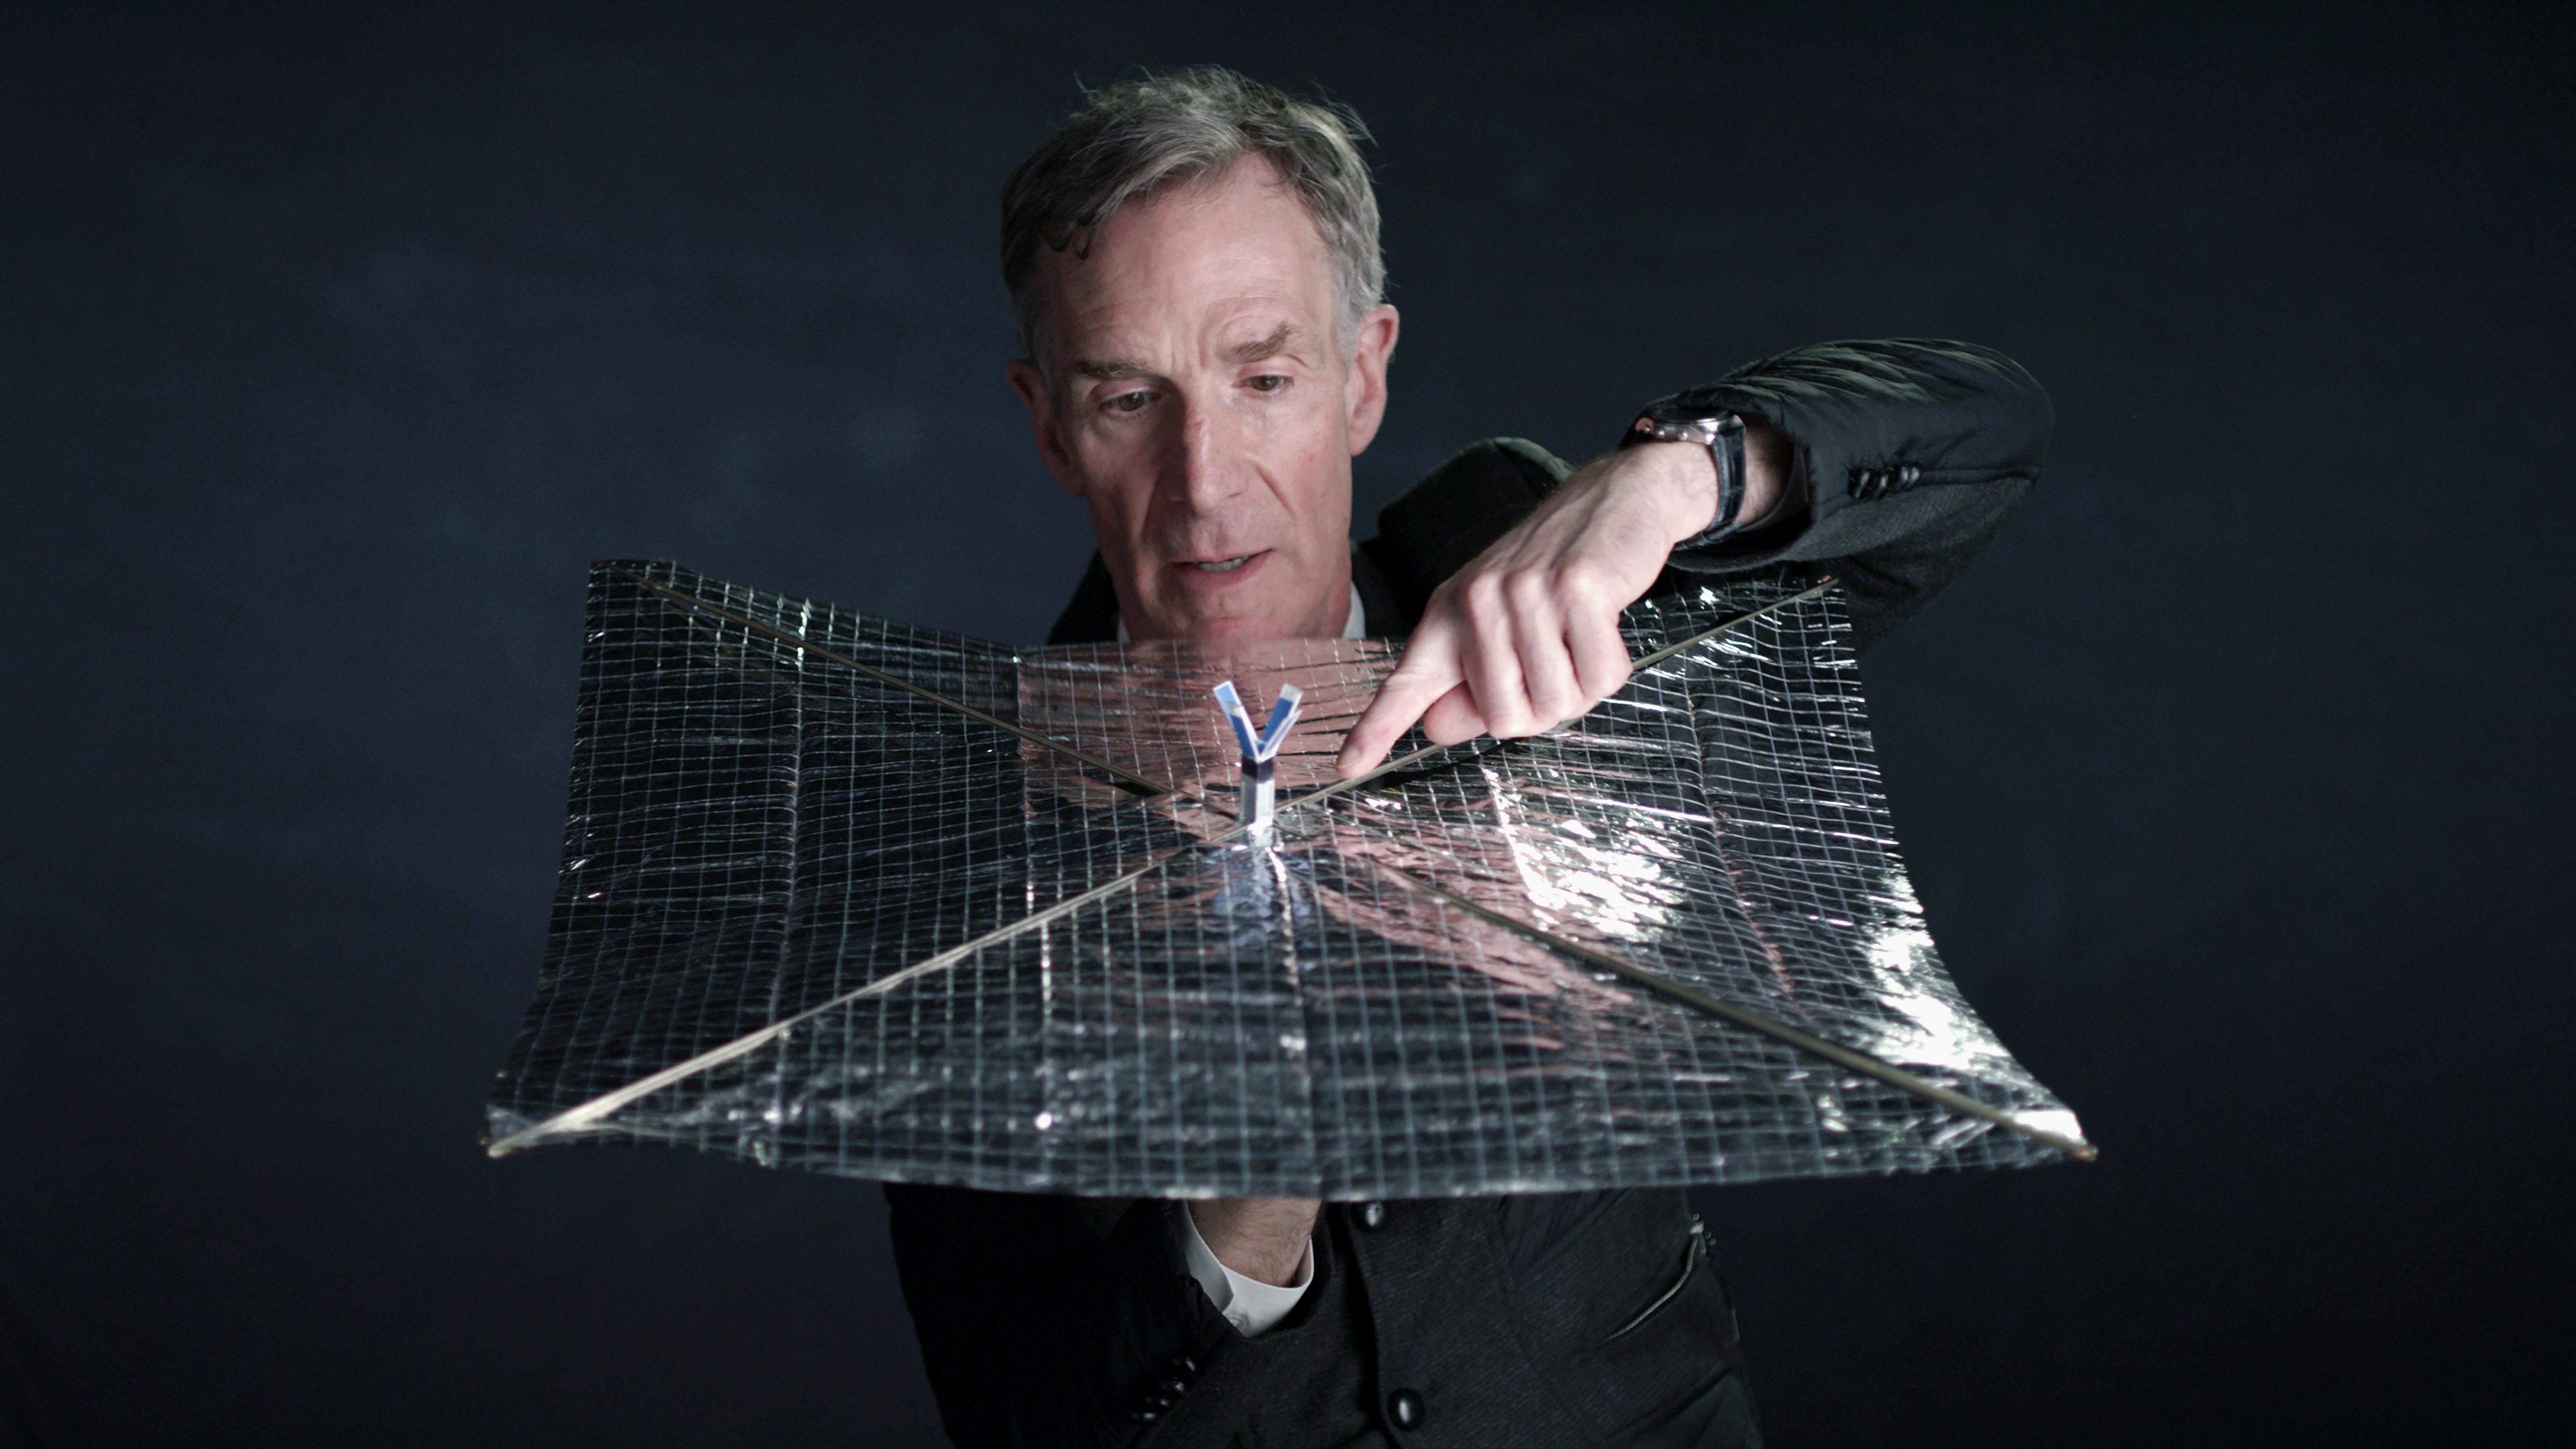 Bill Nye: Science Guy - Teaser